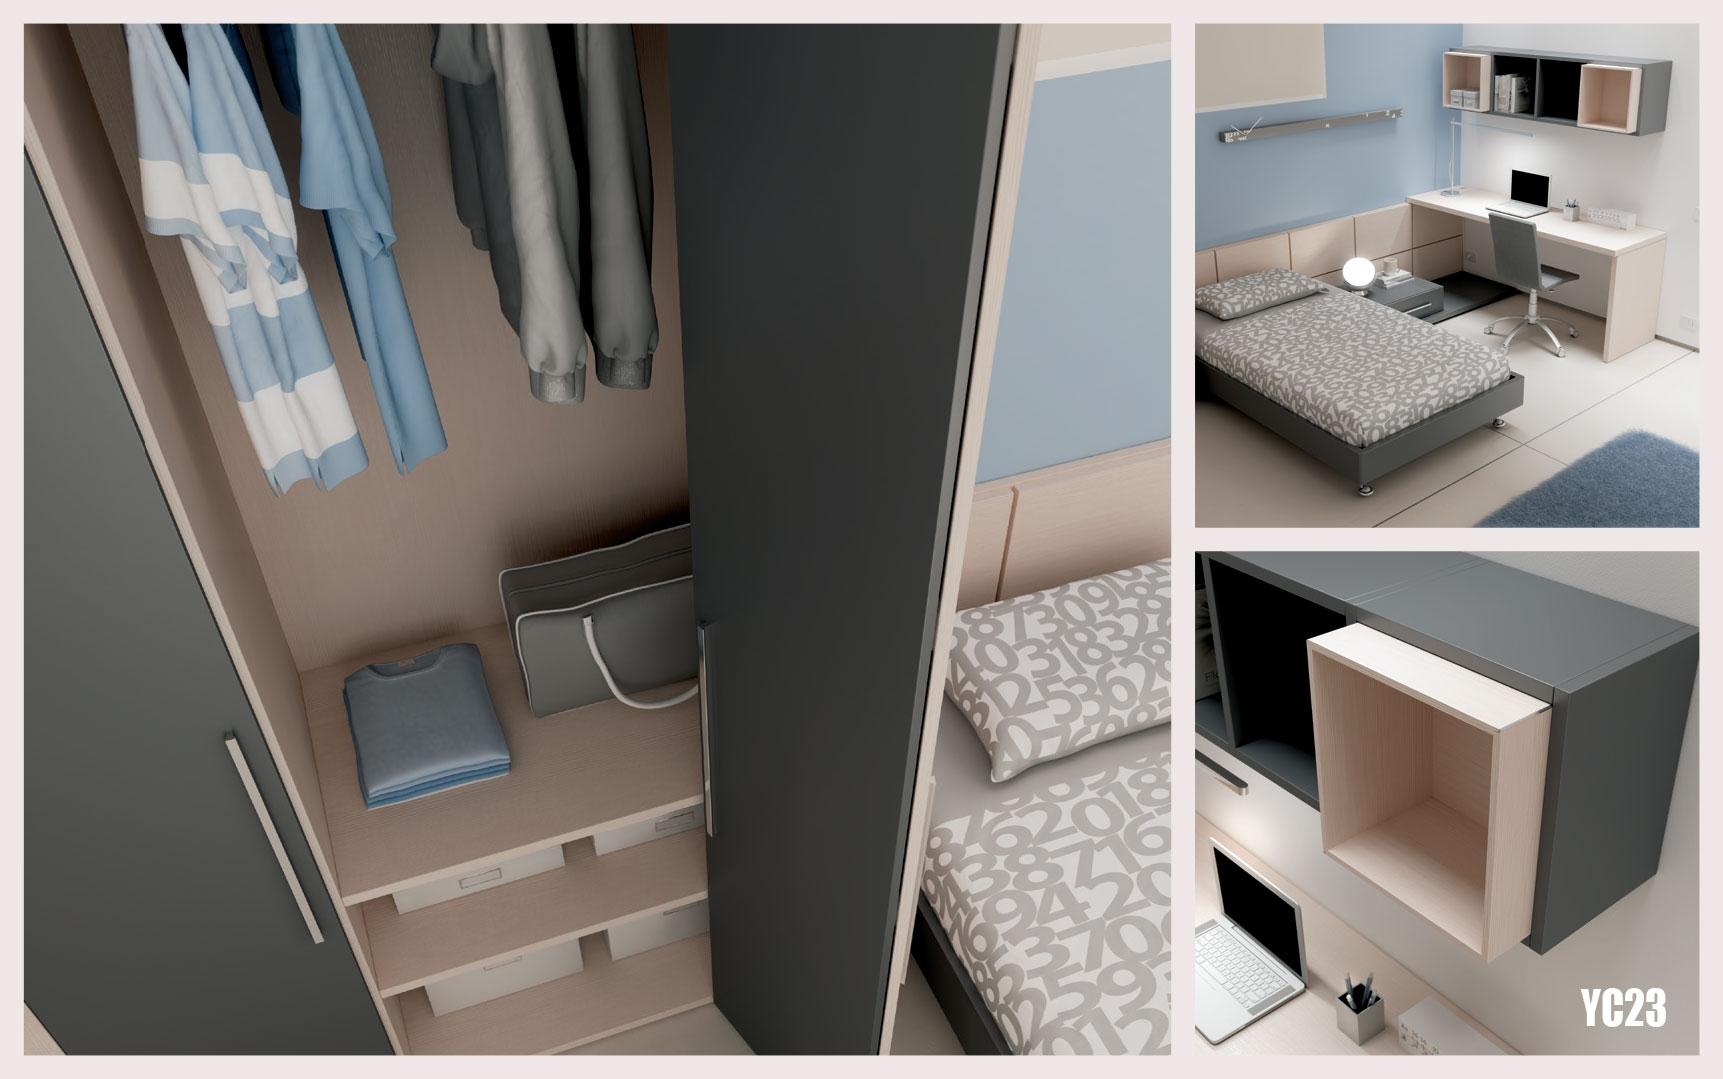 chambre compl te pur e avec t te lit ado moretti compact so nuit. Black Bedroom Furniture Sets. Home Design Ideas